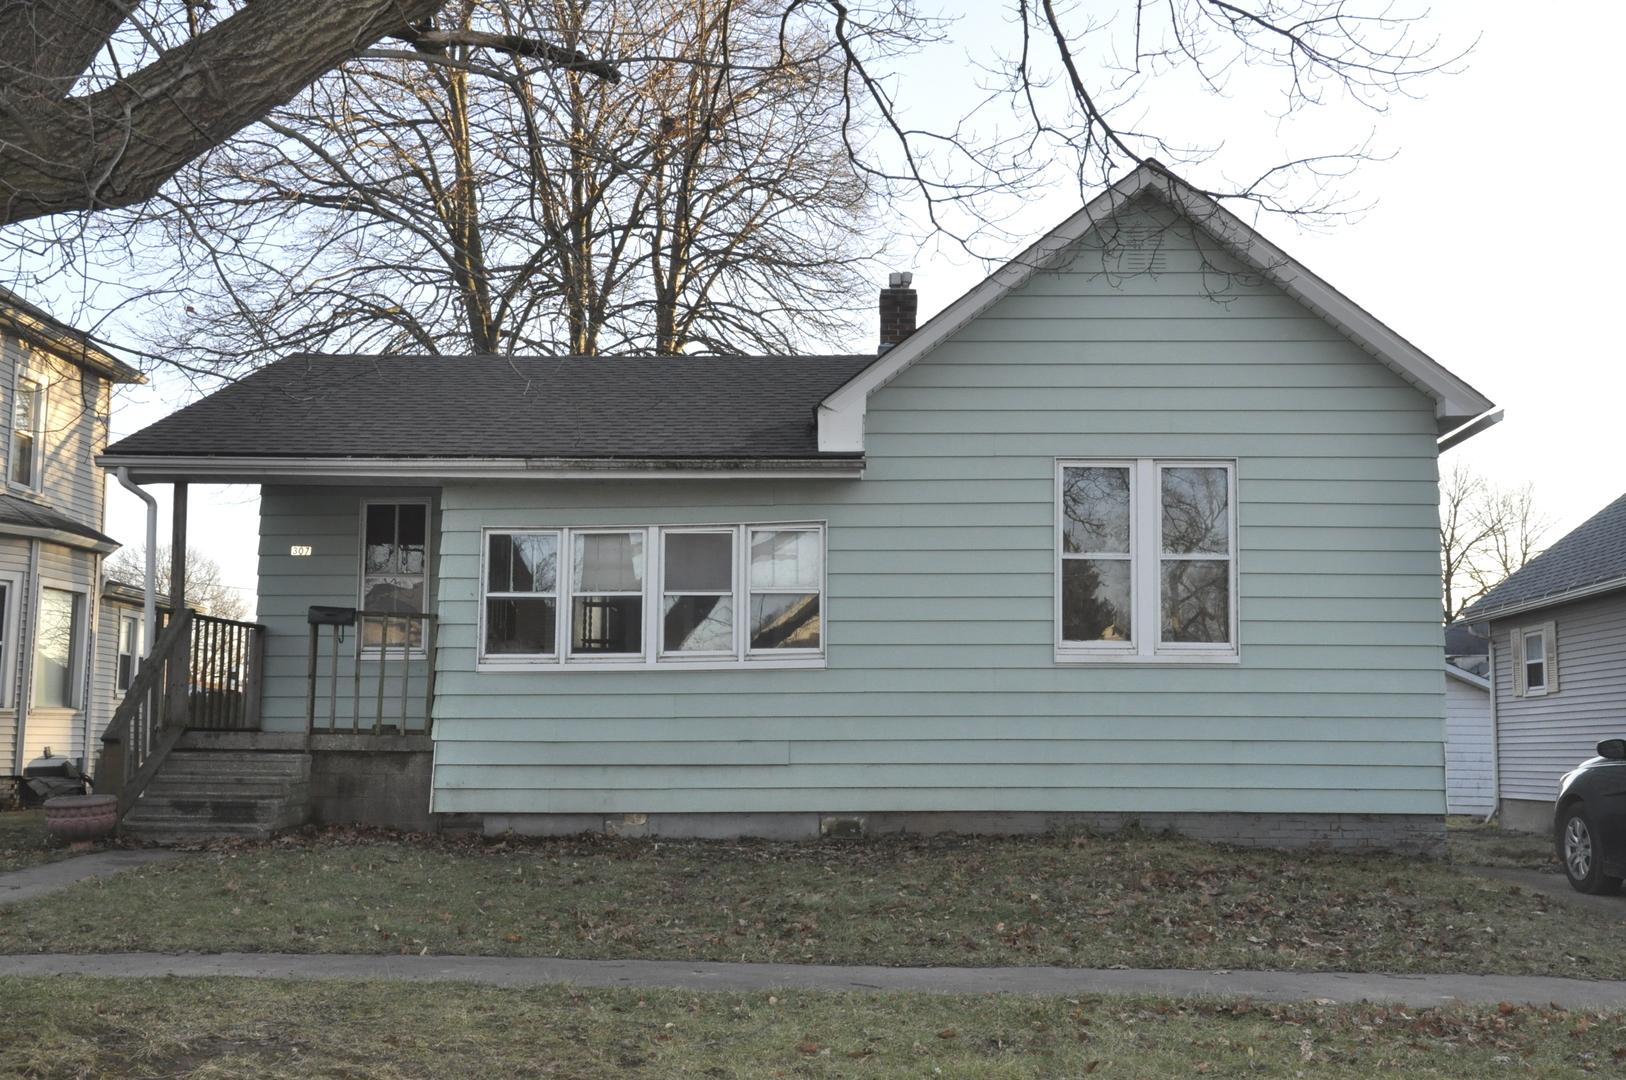 307 West Larue, Streator, Illinois, 61364